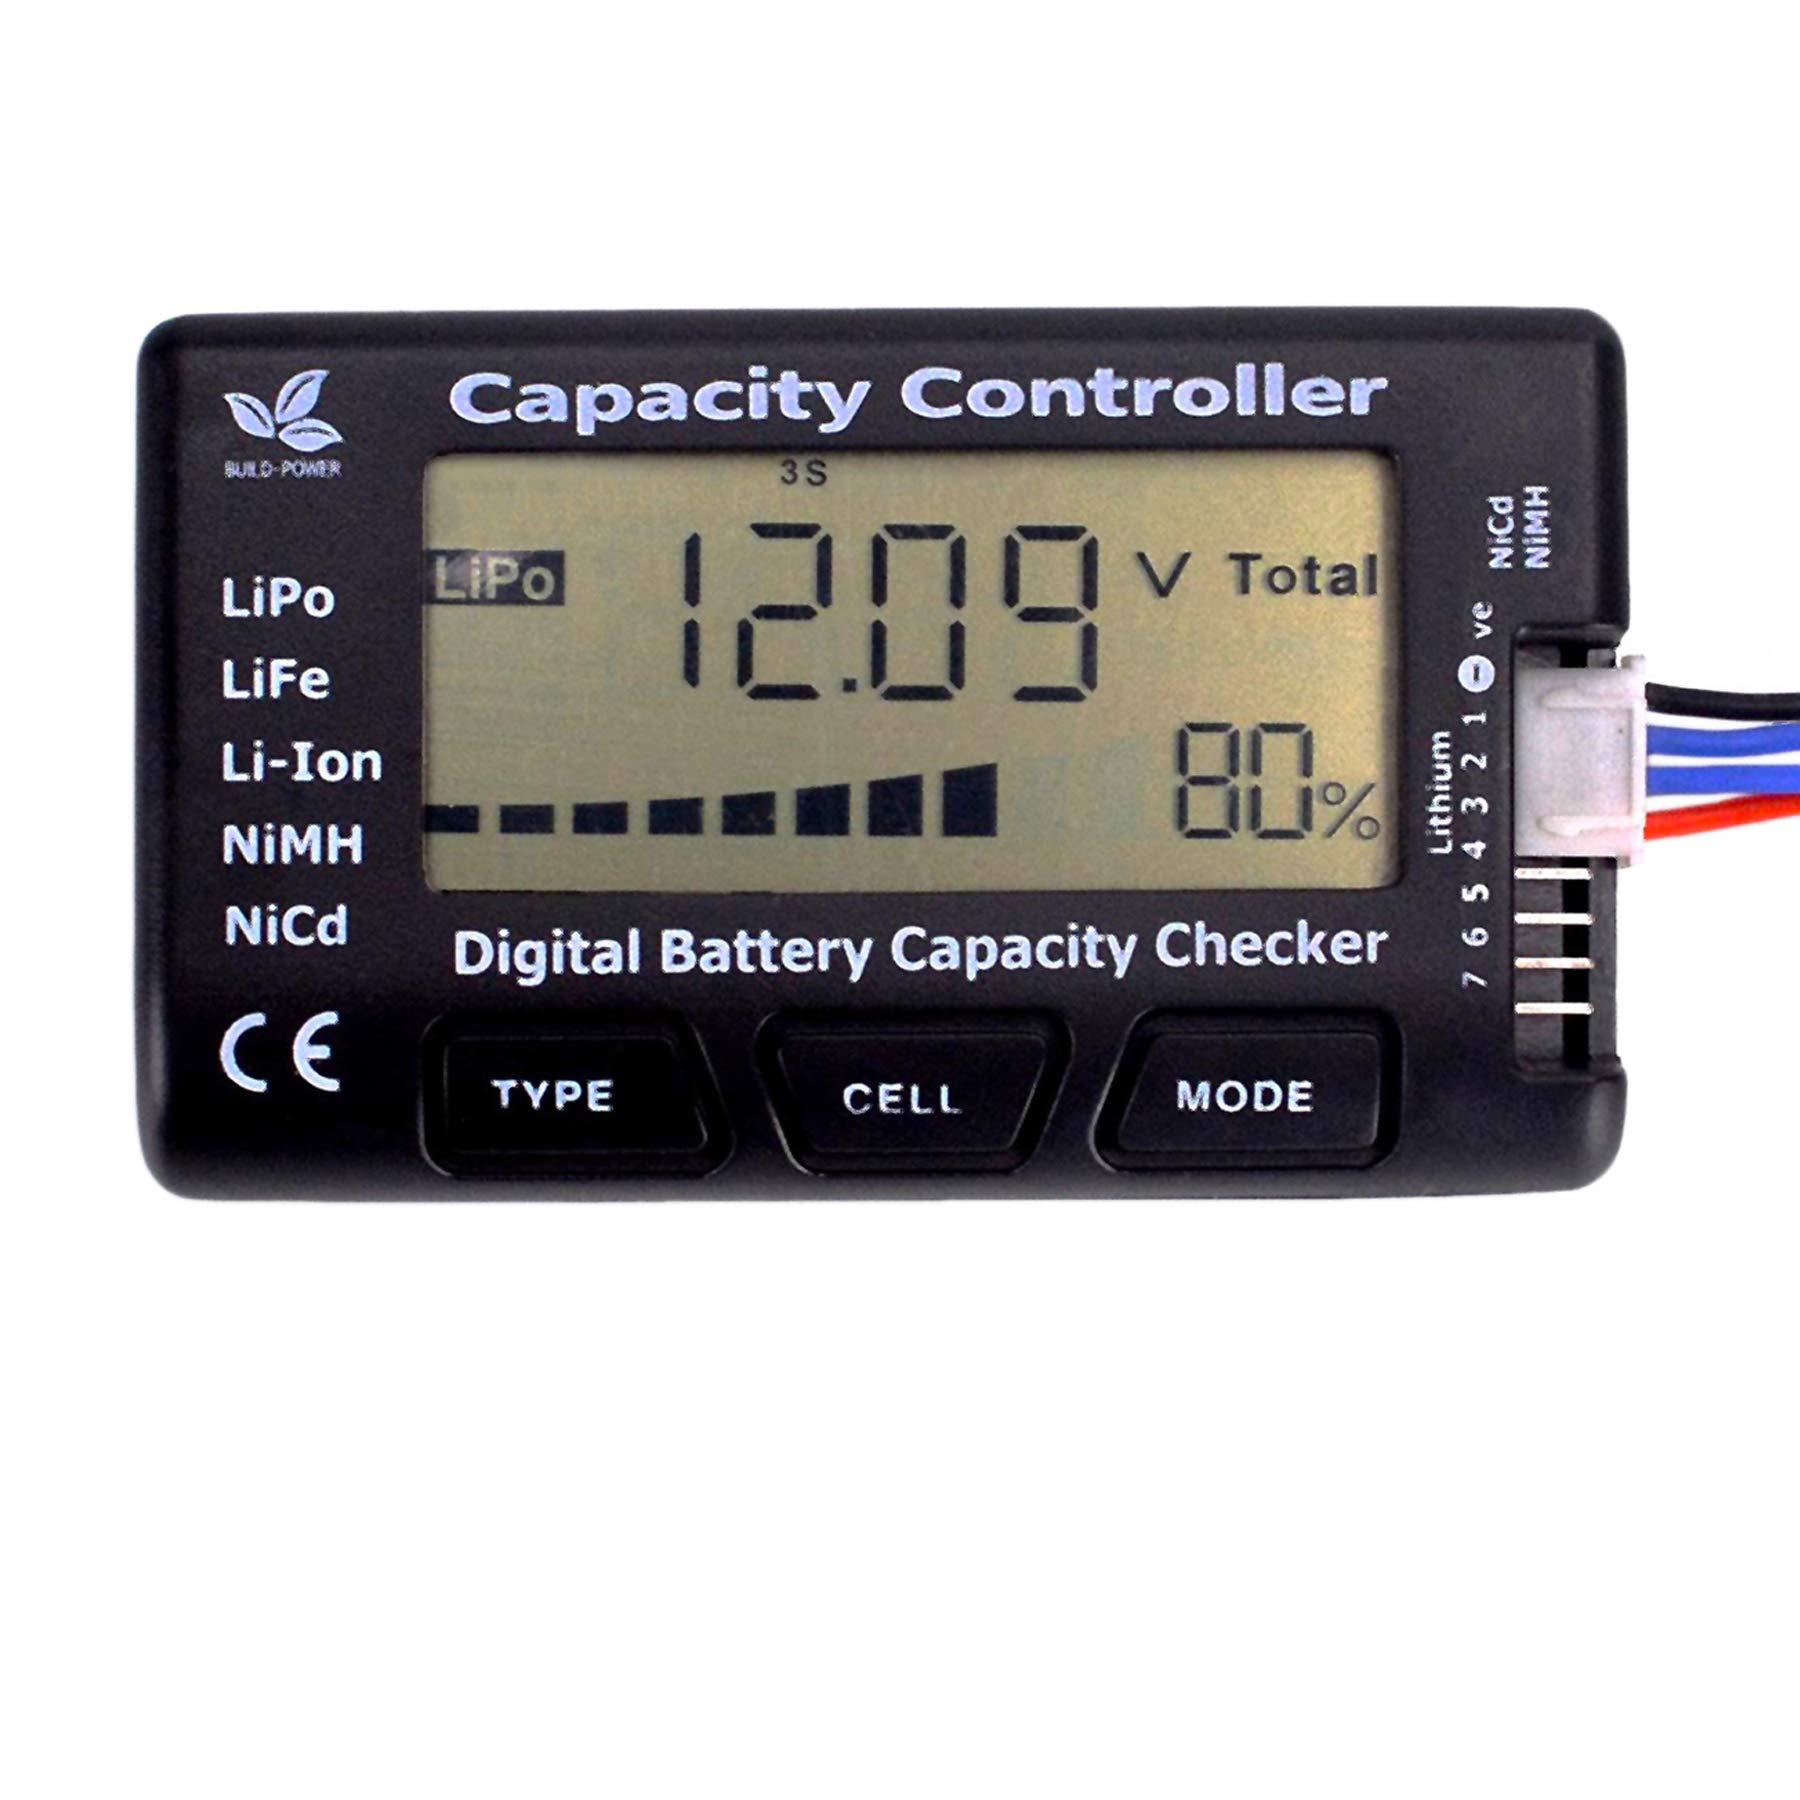 FPVKing RC CellMeter-7 Digital Battery Capacity Checker Controller Tester for LiPo LiFe Li-ion NiMH Nicd